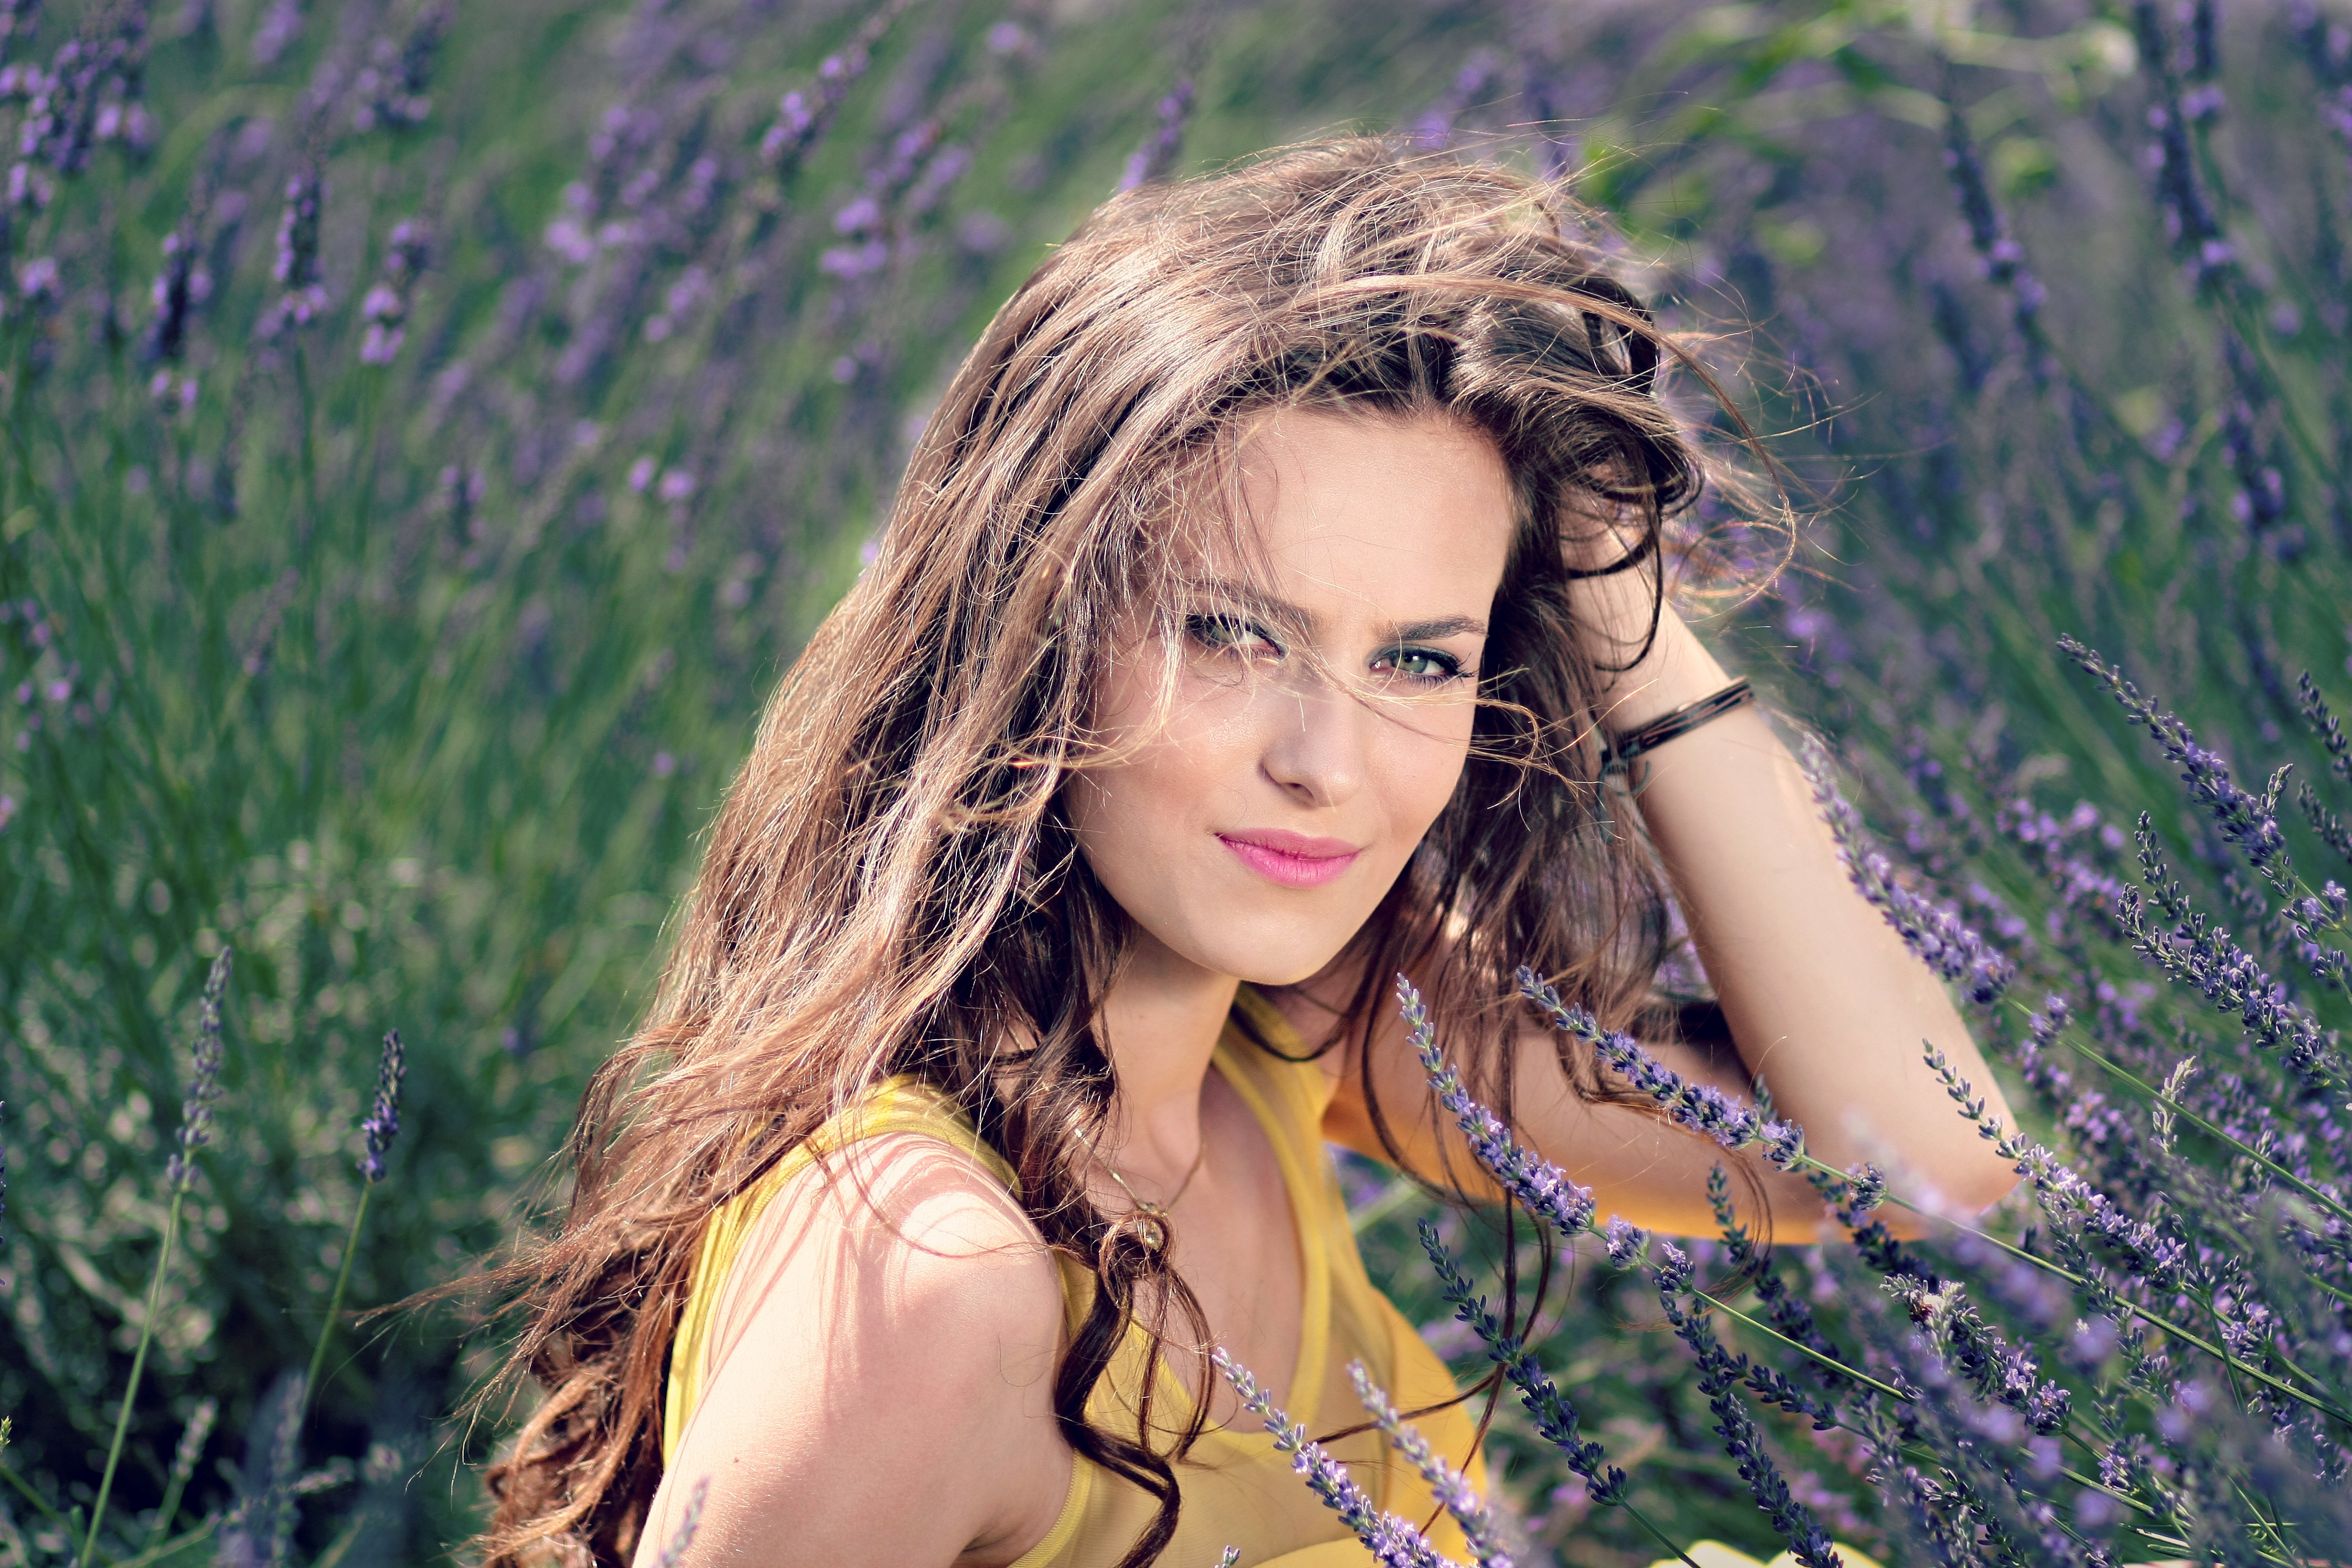 girl-lavender-flowers-mov-115008.jpeg